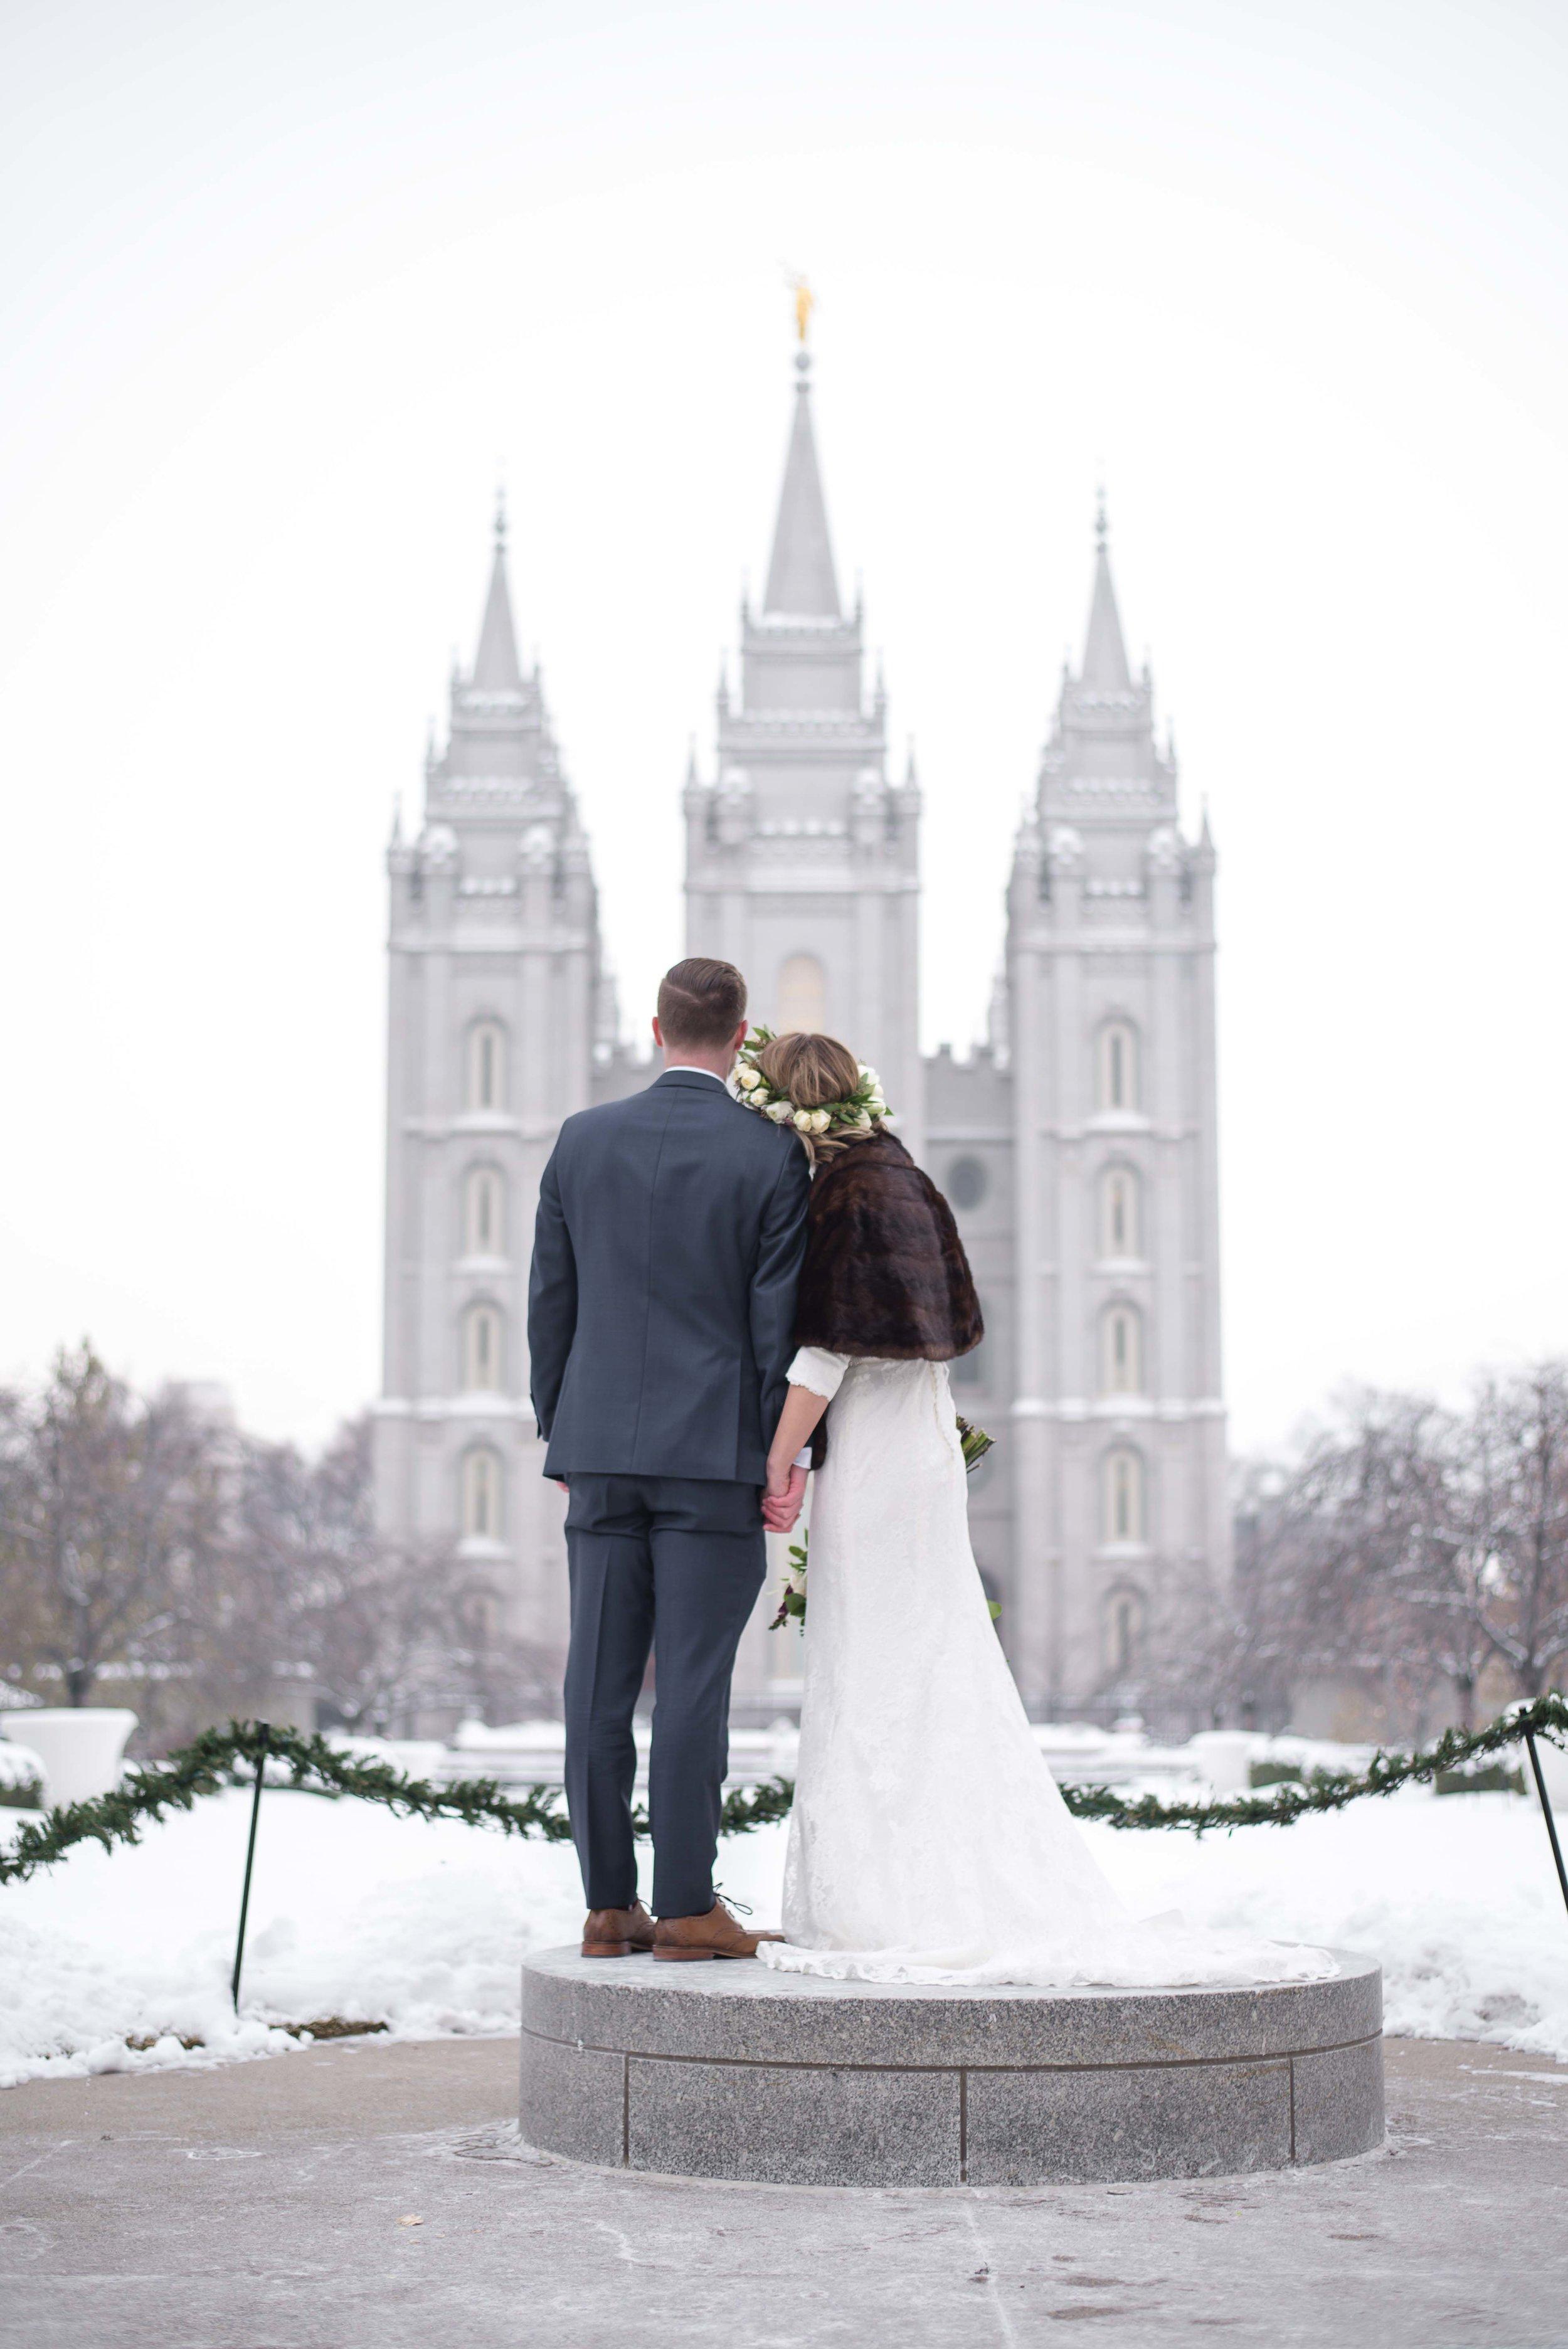 Tess+Garrett-Wedding-Day-Sadie-Banks-Photography-196.jpg